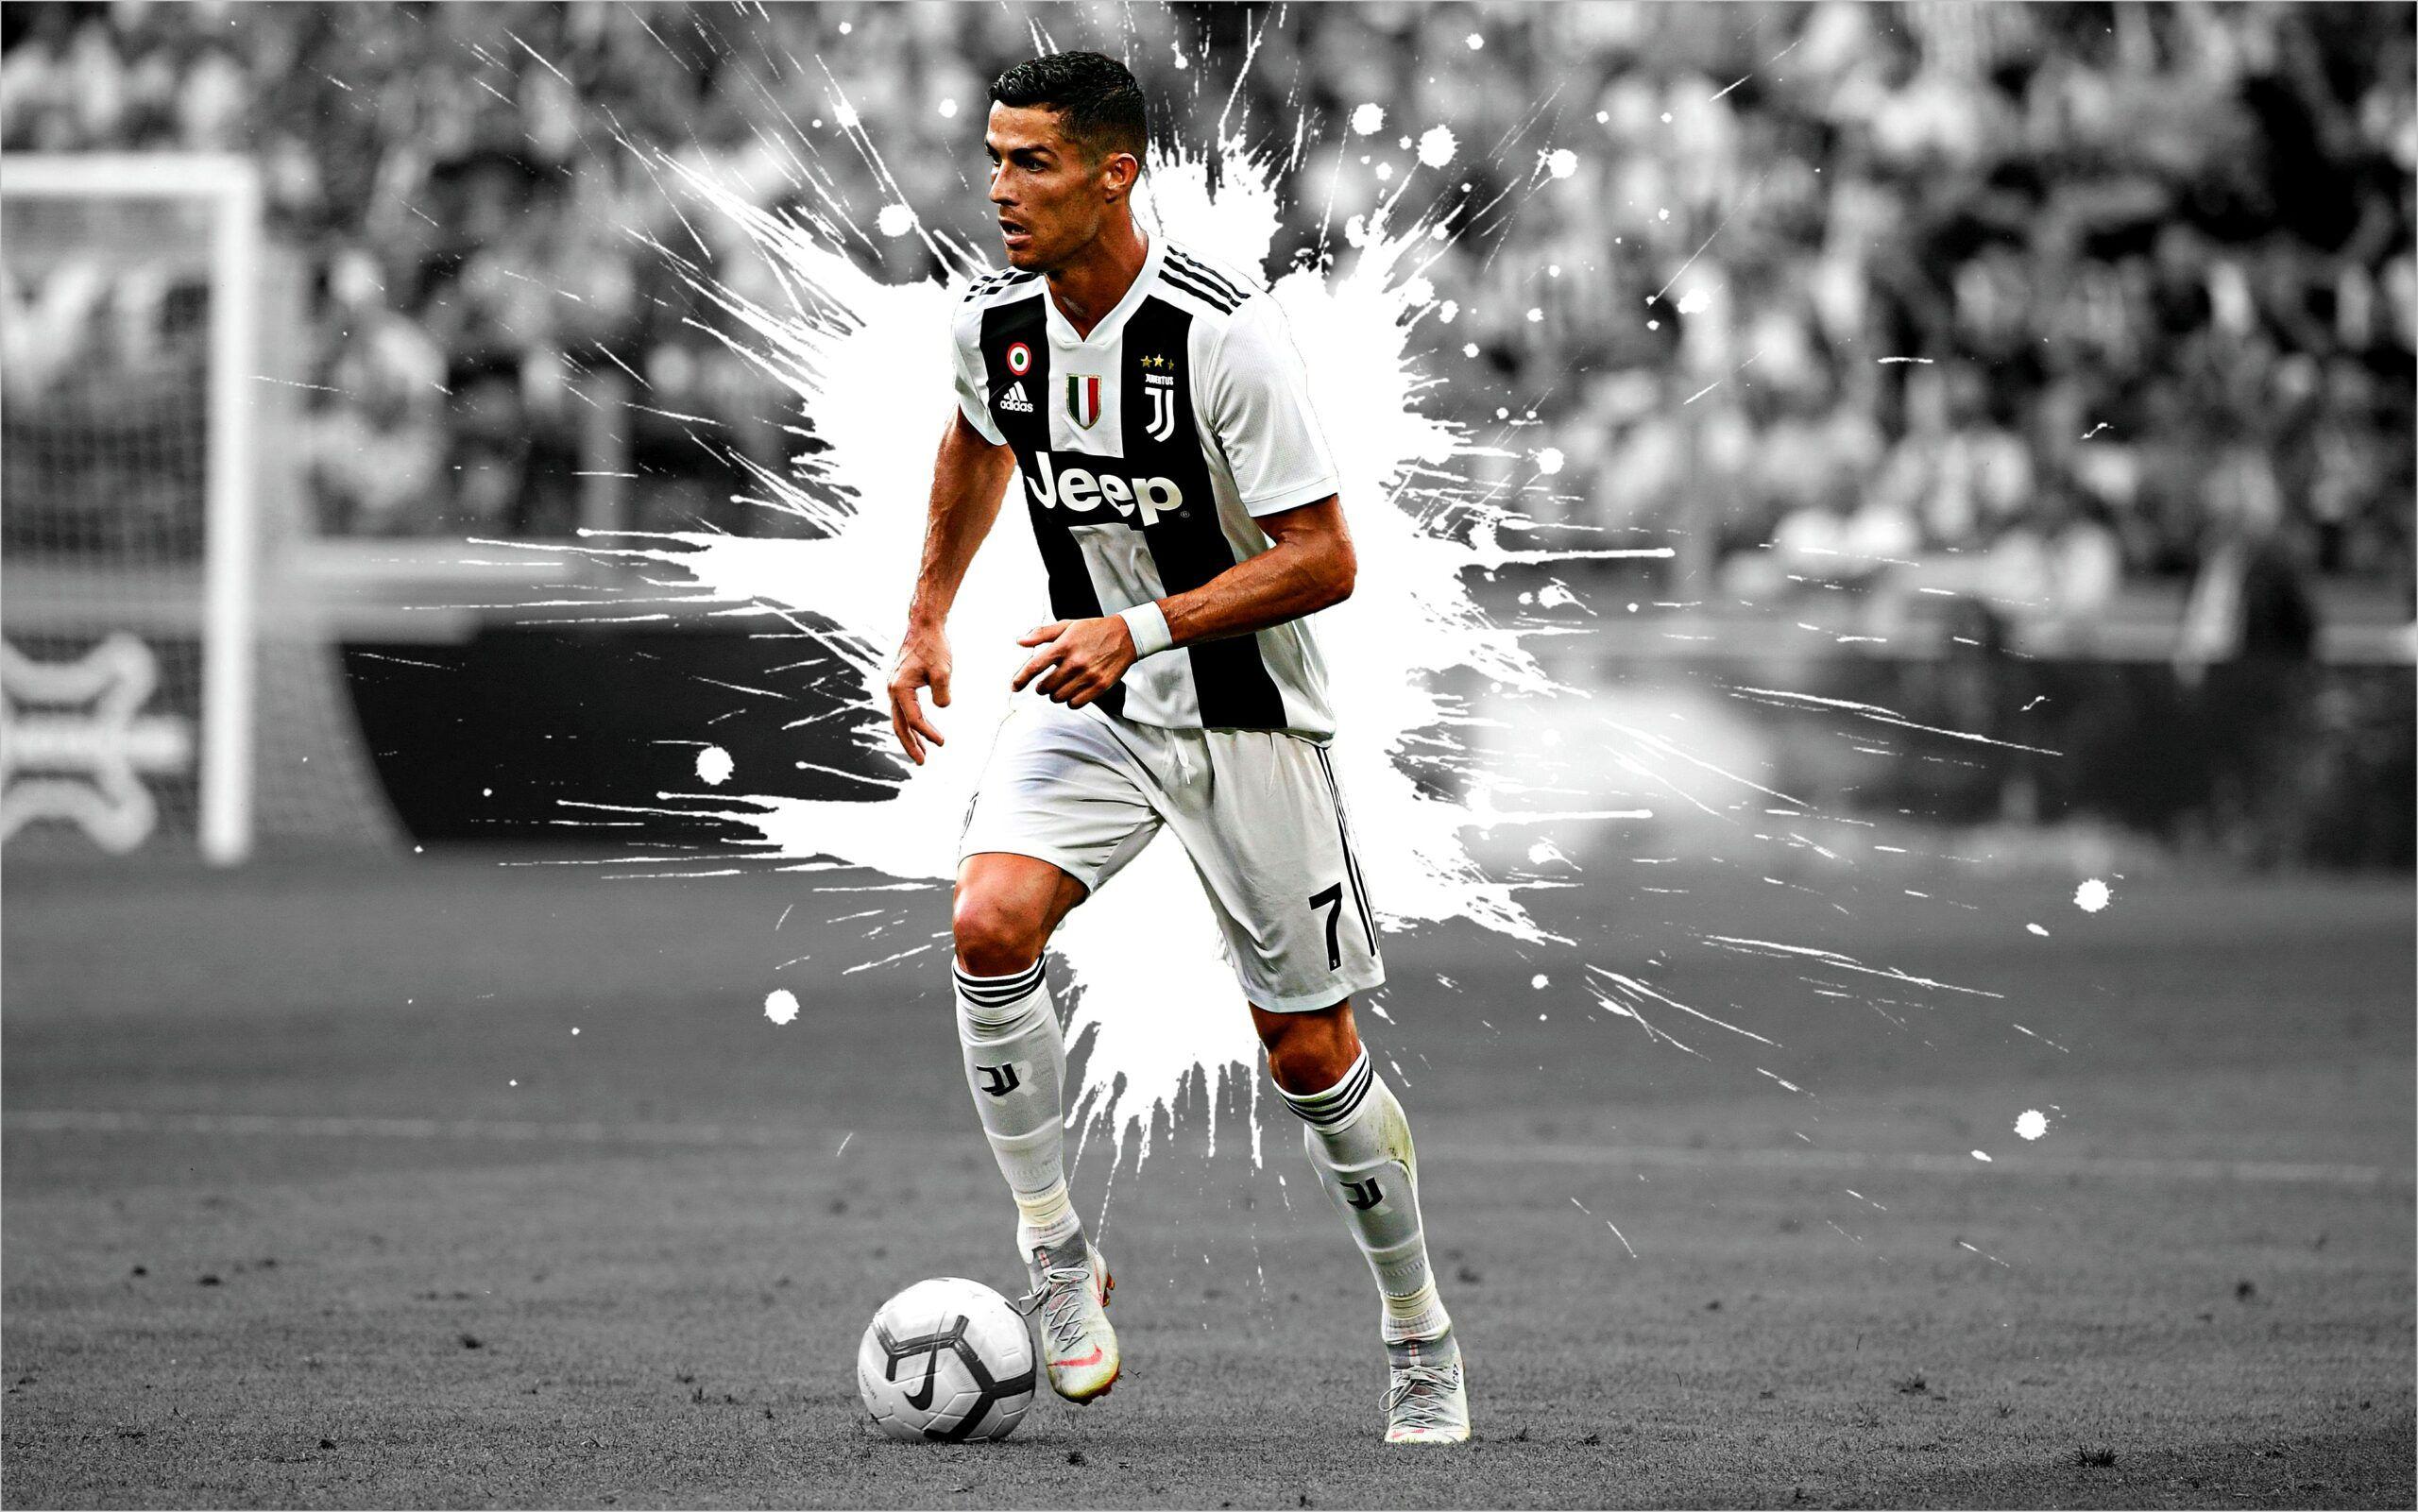 Ronaldo Juventus Wallpaper 4k Cristiano Ronaldo Ronaldo Juventus Ronaldo